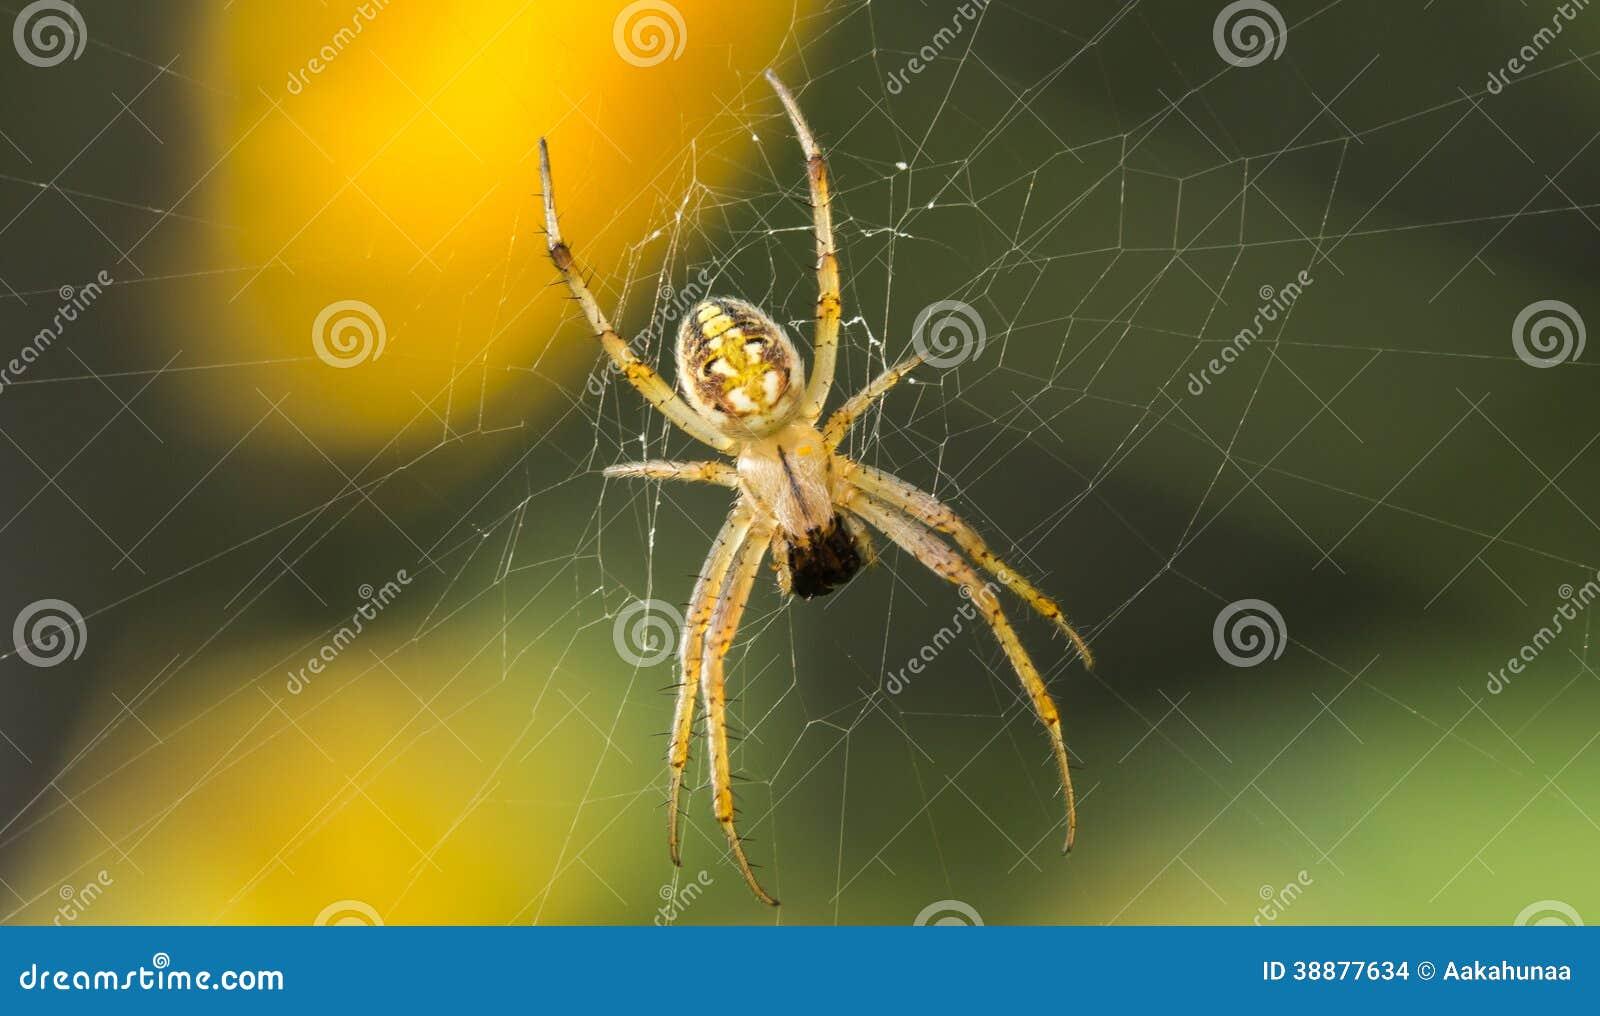 Predatory spiders